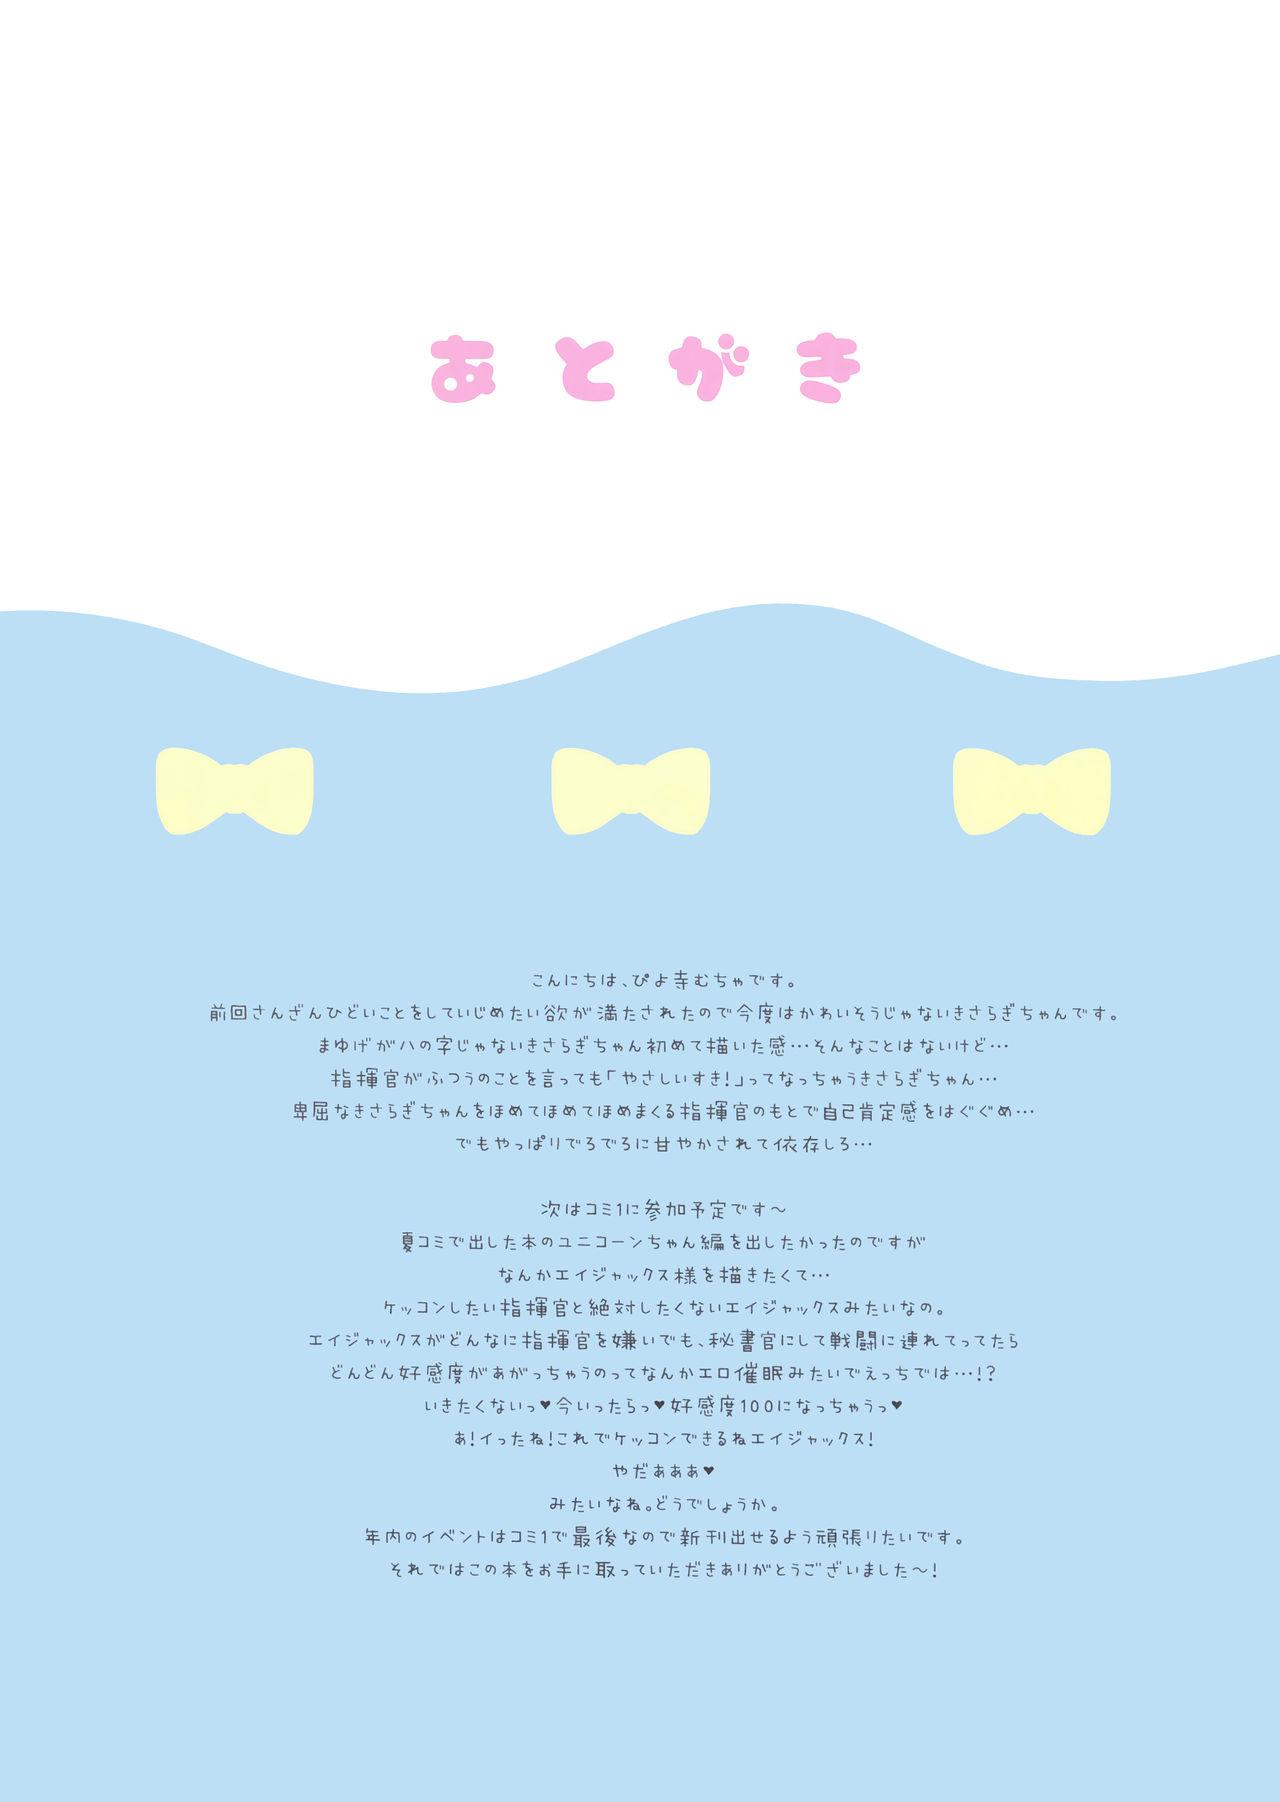 (Mimiket 40) [PiyoPit (Piyodera Mucha)] Kisaragi-chan wa Kawaisou ja Nai! - Kisaragi-chan is not pitiful! (Azur Lane) 14